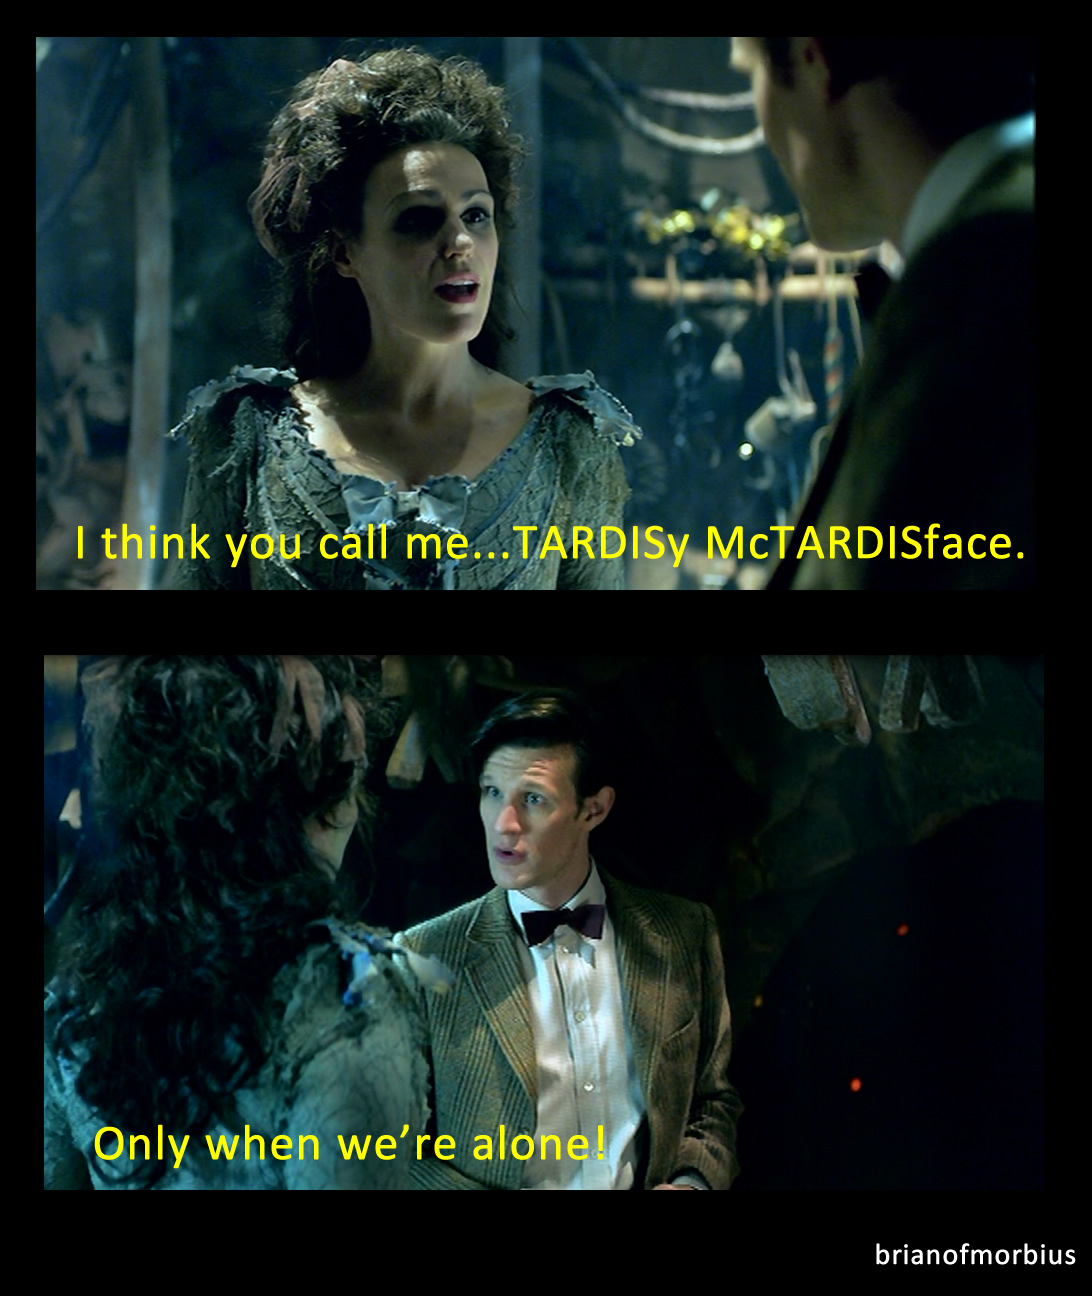 Boaty_TARDIS